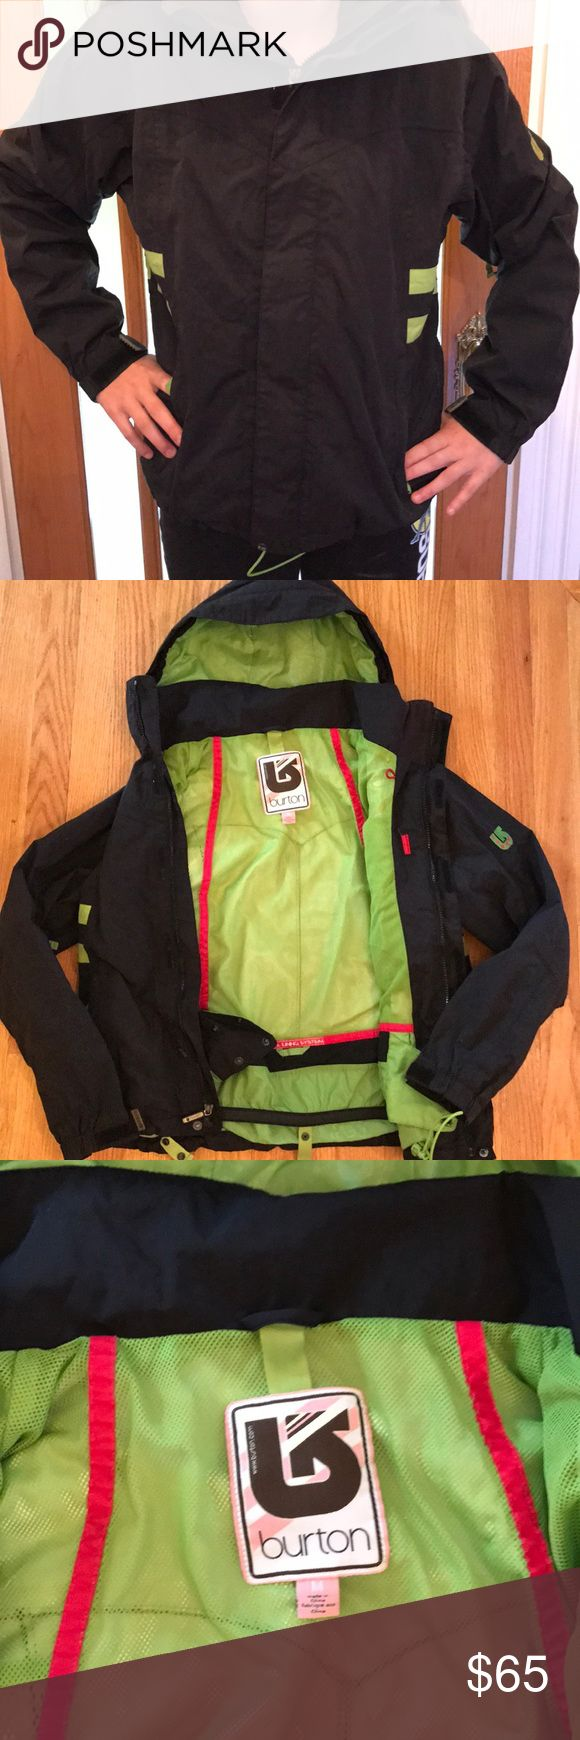 Women's Burton Ski/Snowboard Jacket Women's Burton Ski/Snowboard Jacket. Size Medium. Color is black/with bright green. Outershell is 100% Nylon. Membrane is 100% polyurethane. Great condition. Burton Jackets & Coats